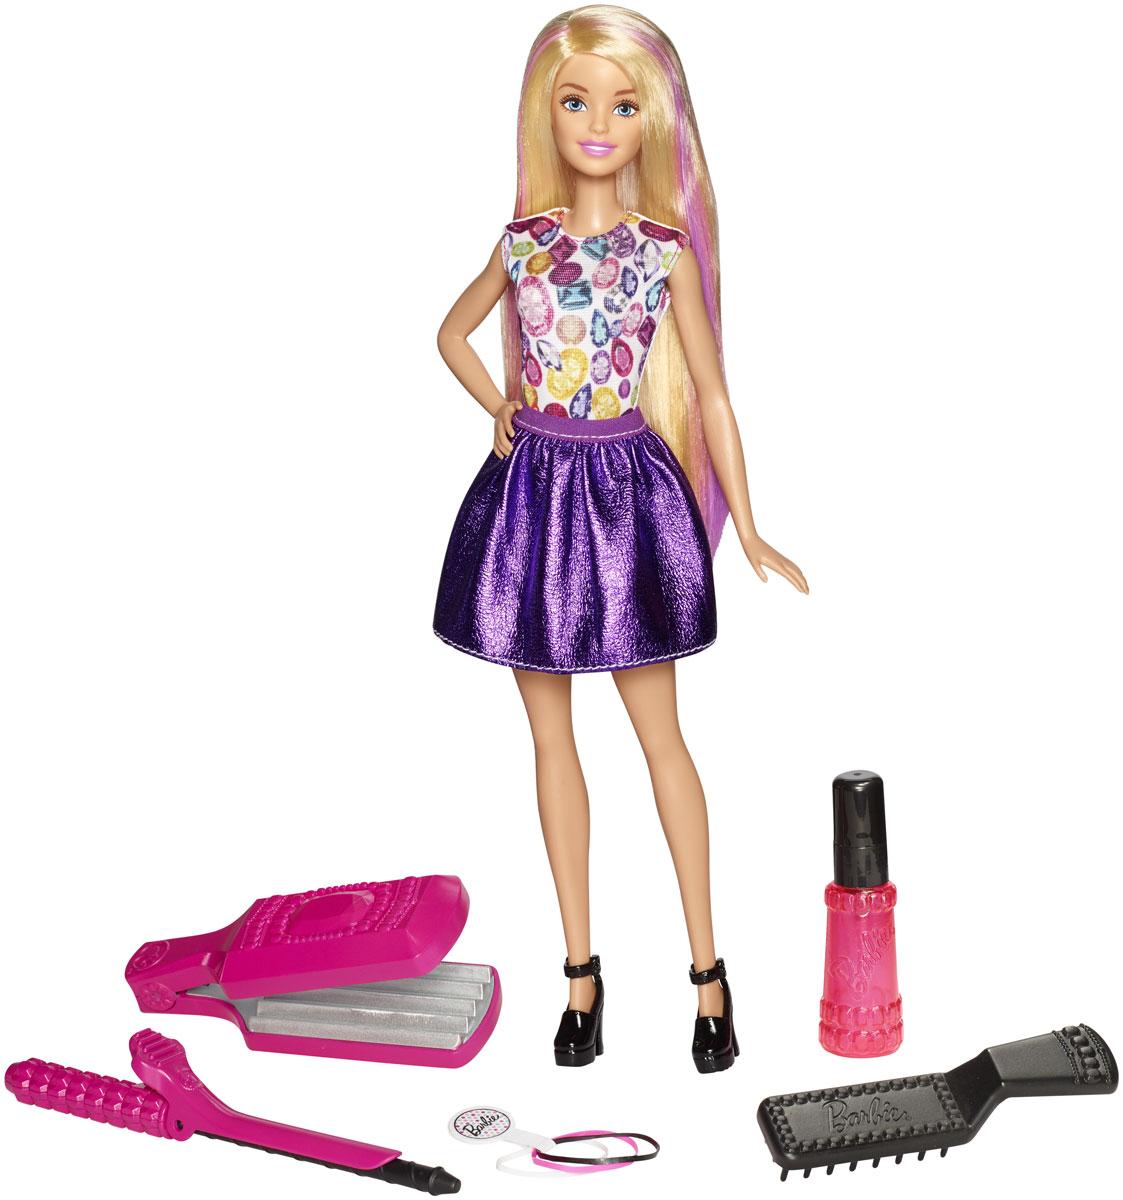 Barbie Кукла Цветные локоны плойка harizma professional h10219 glory фен плойка 1 шт